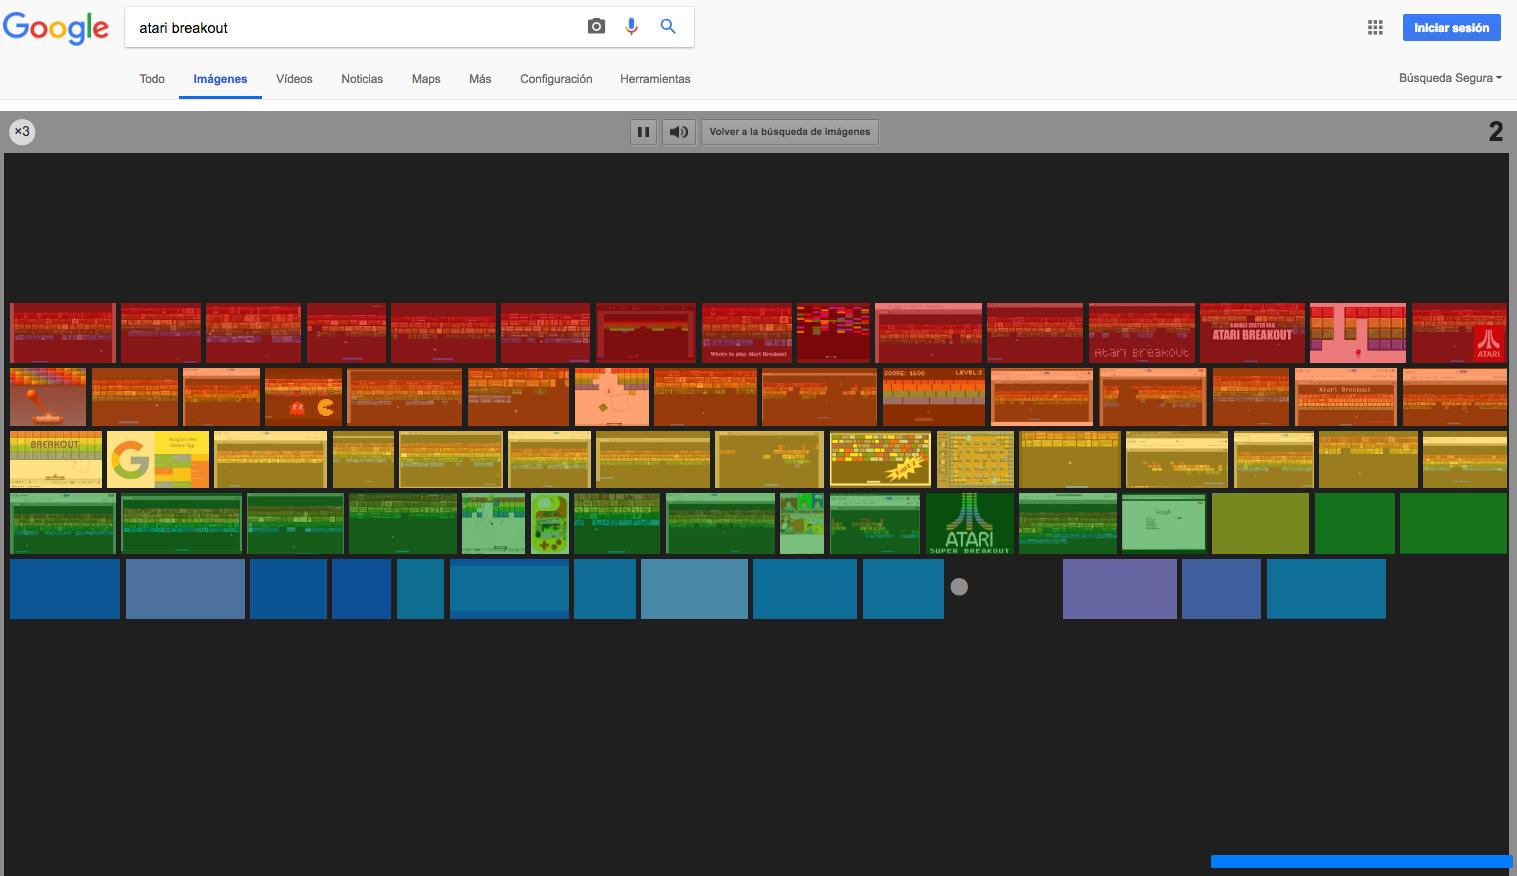 Atari Breakout Google Imagenes